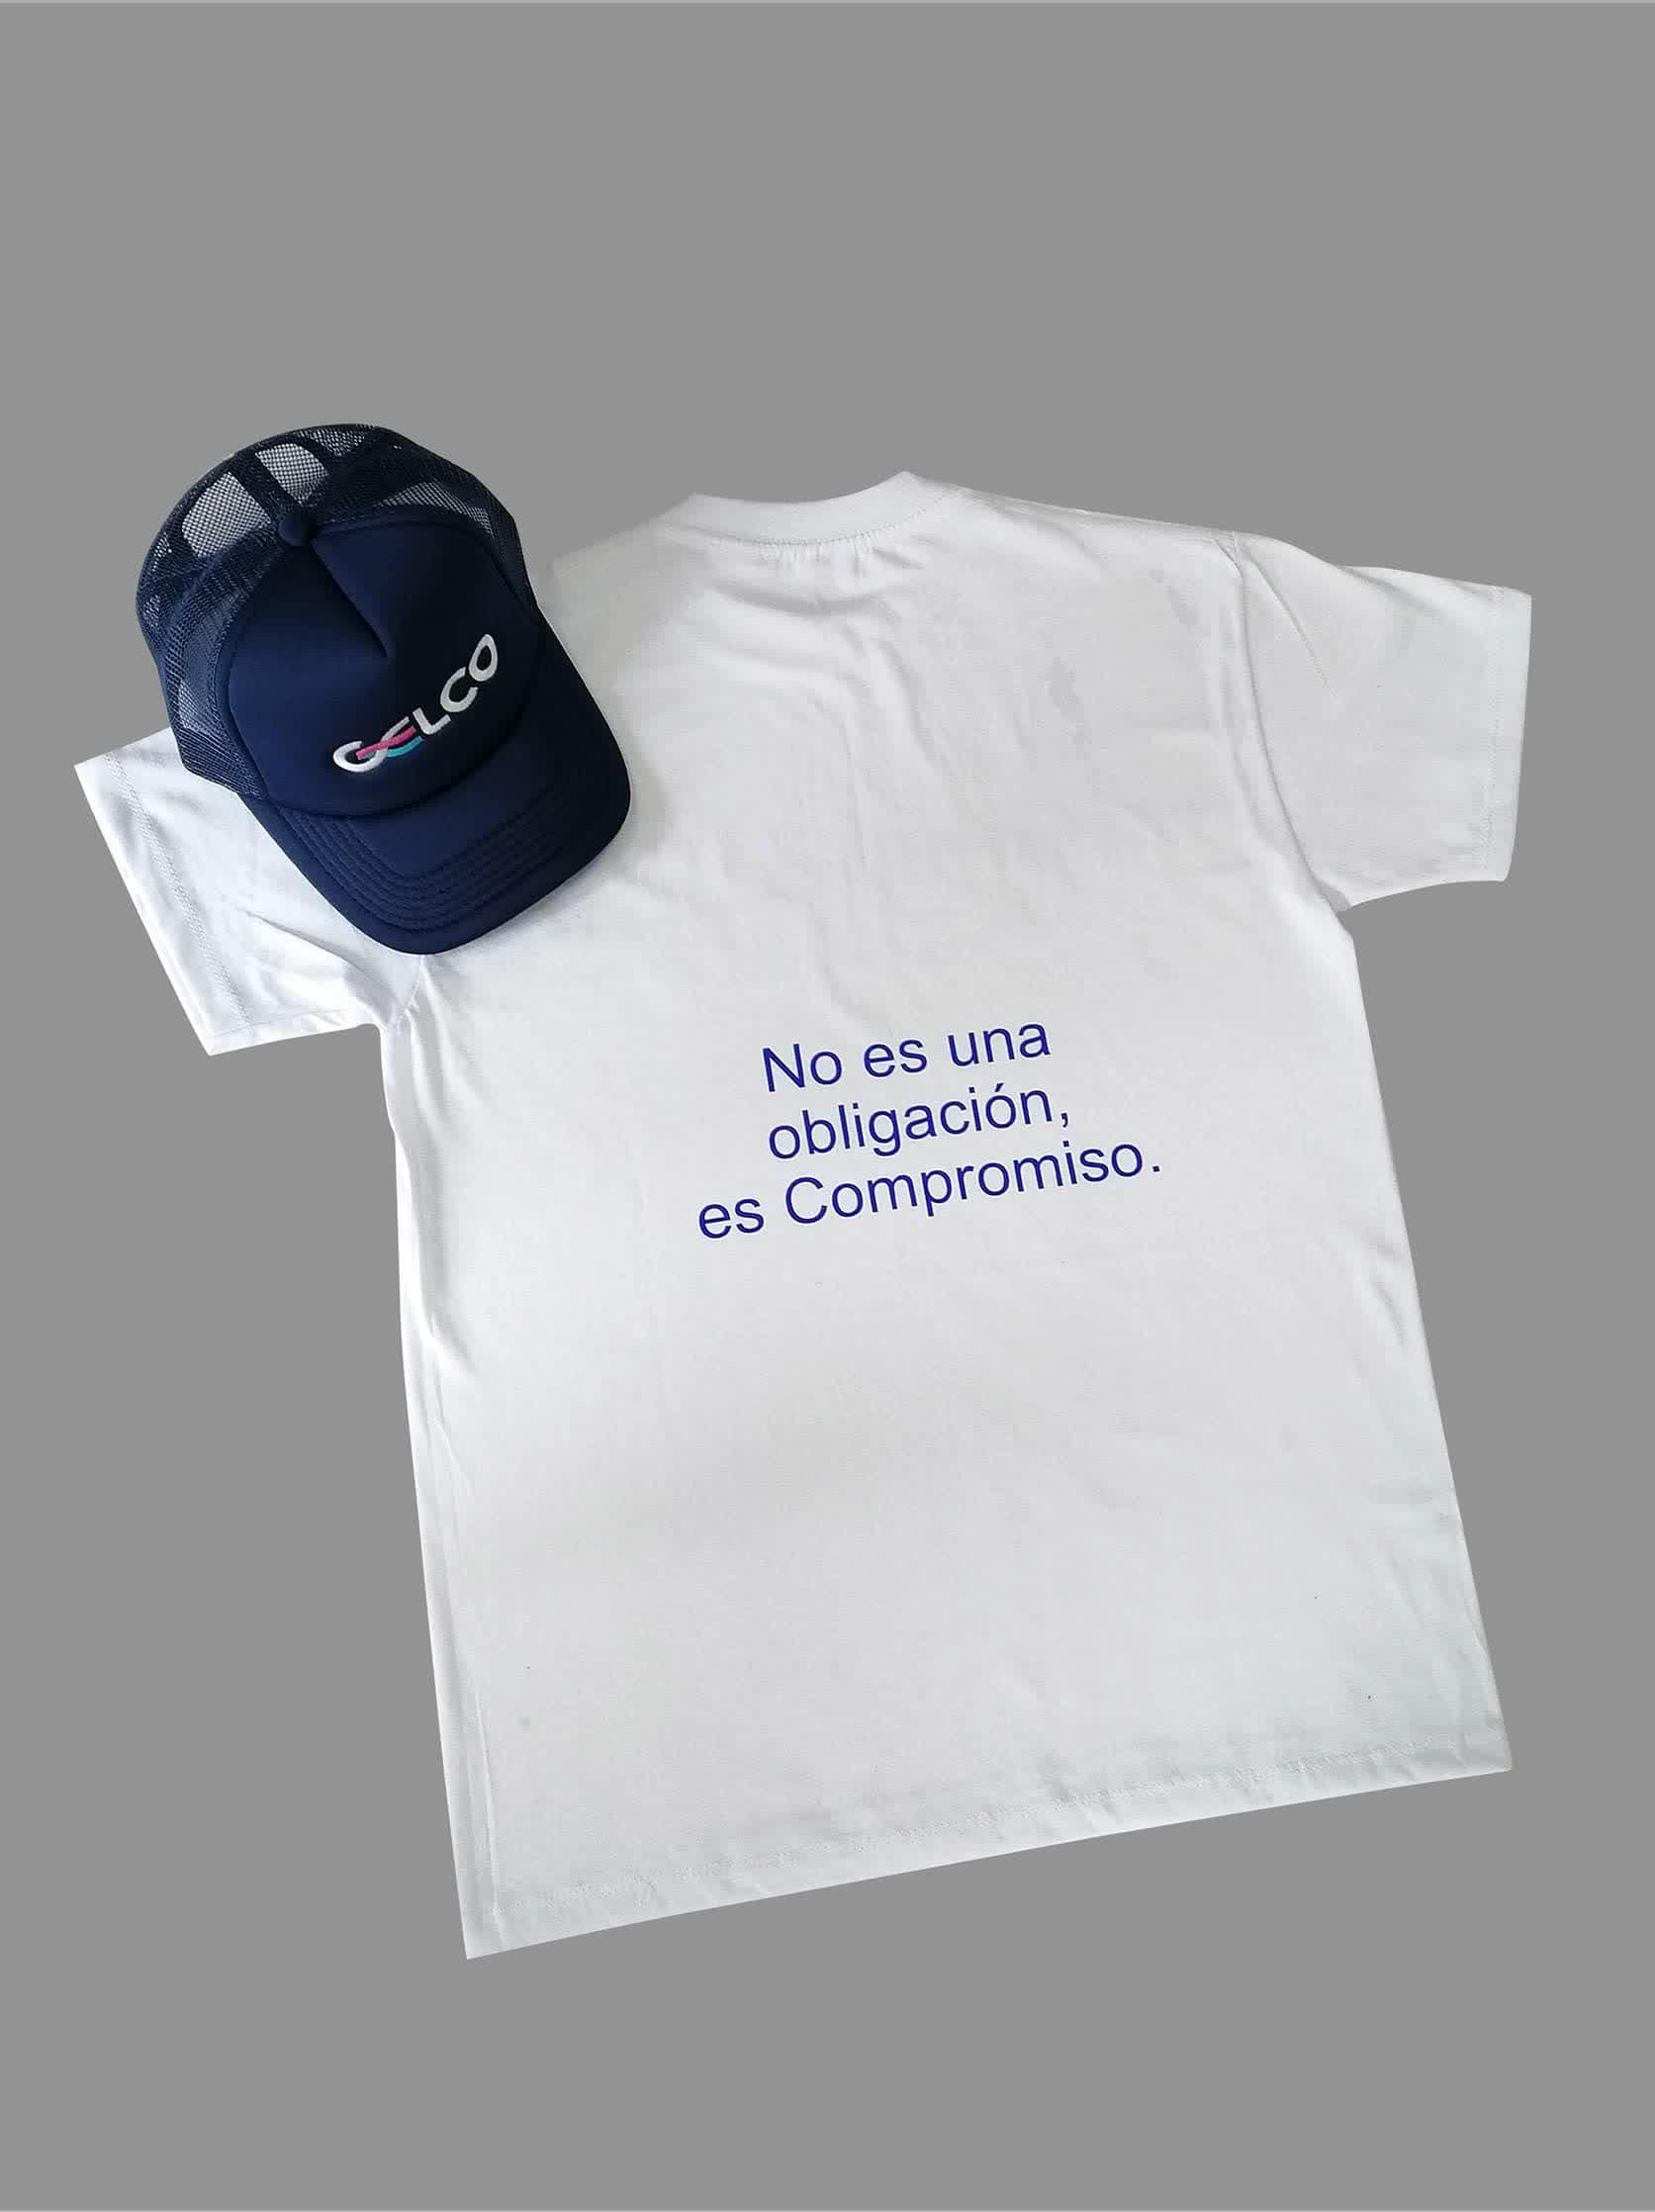 camisetas para empresas